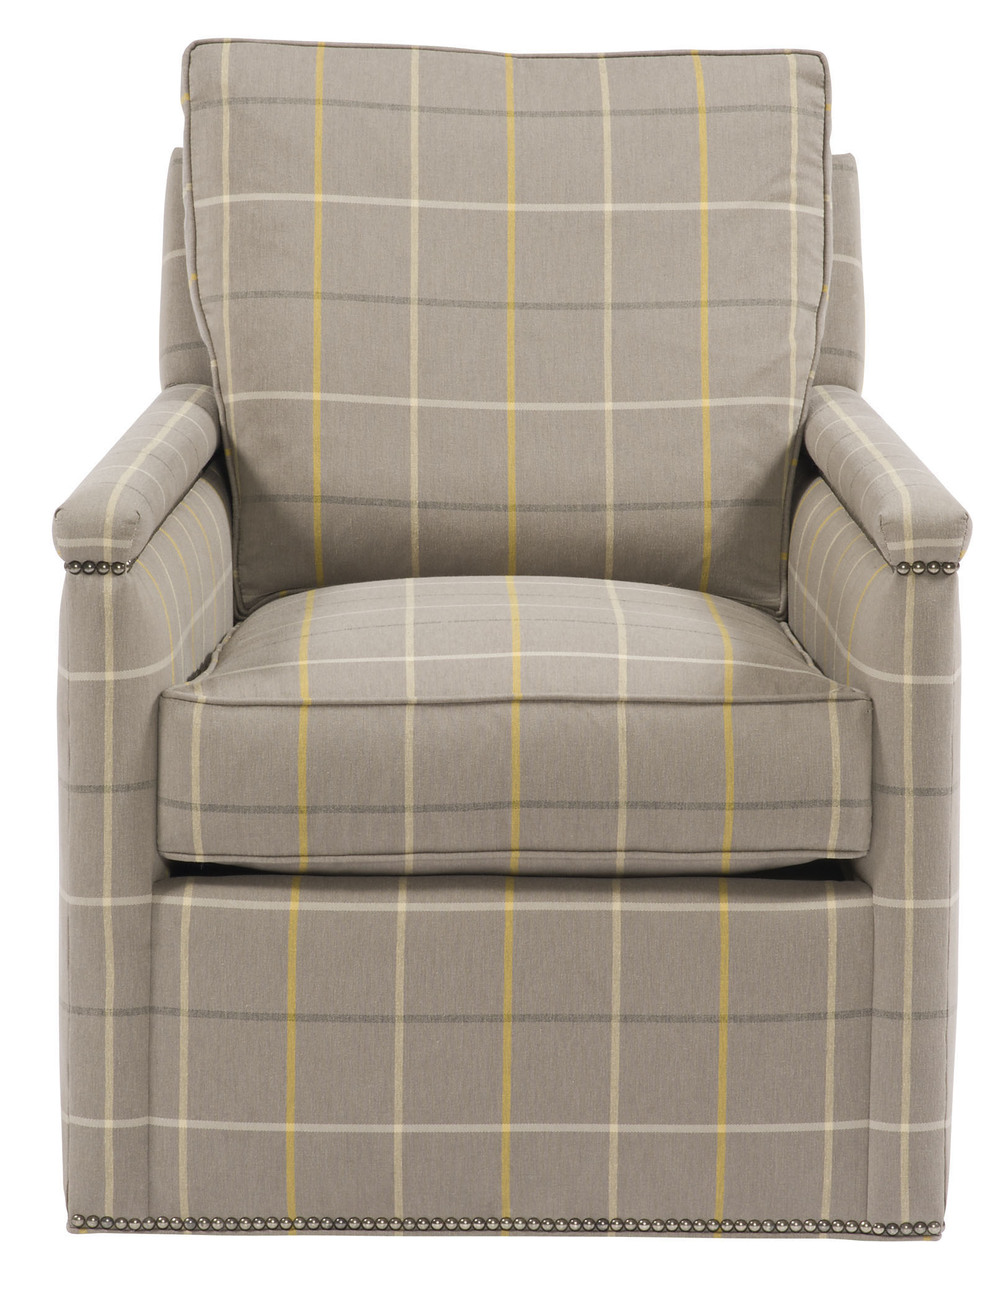 Vanguard Furniture - Liz Swivel Chair